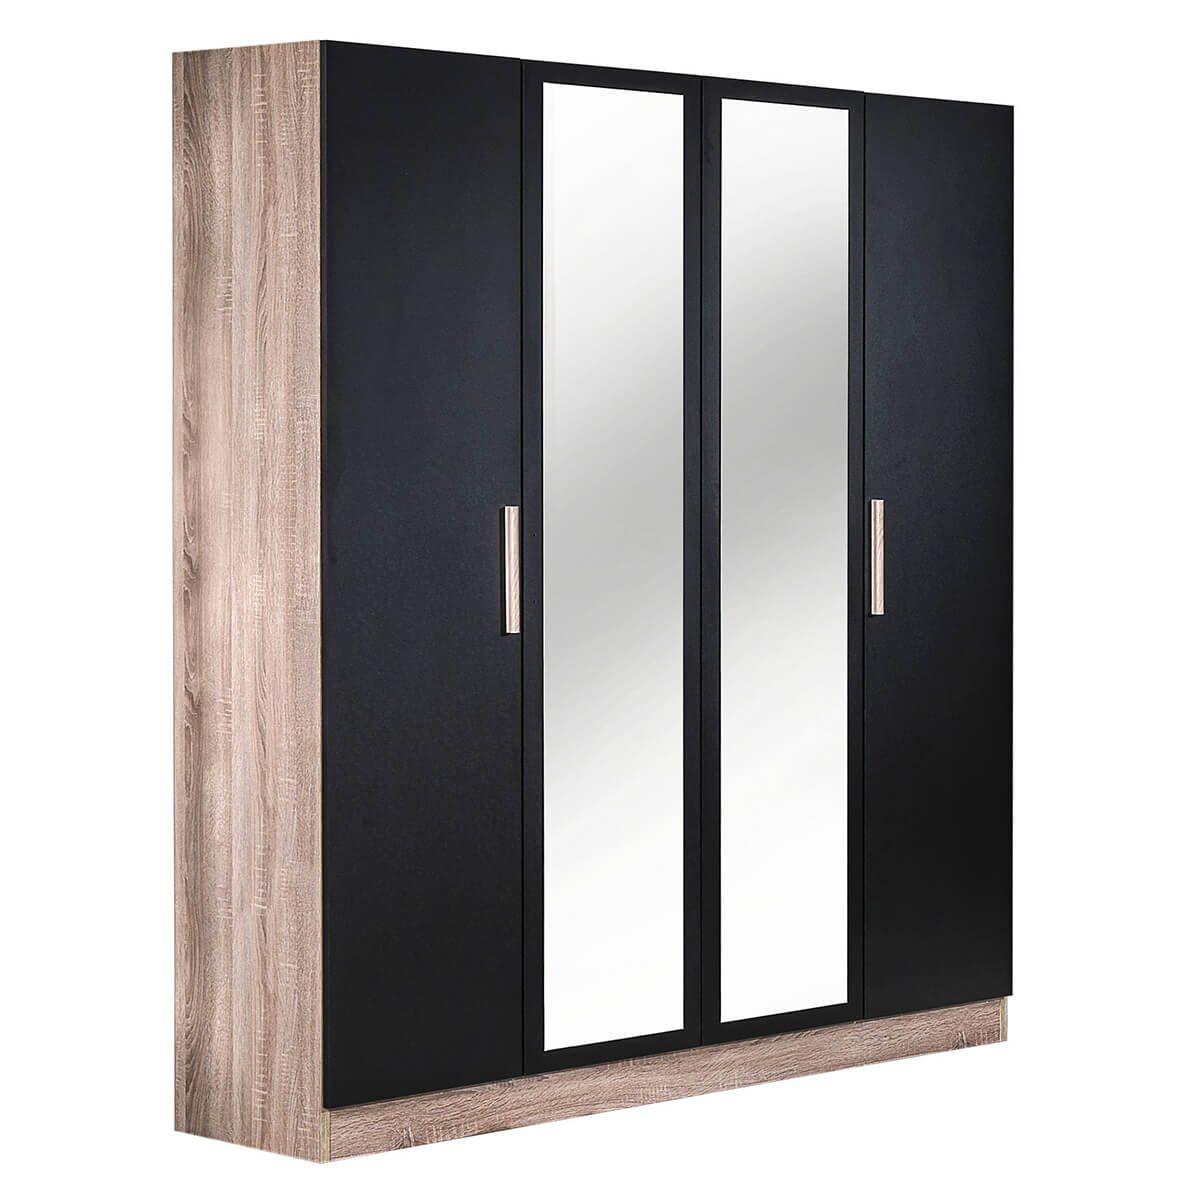 Armoire 4 Portes avec Miroir Central (photo)